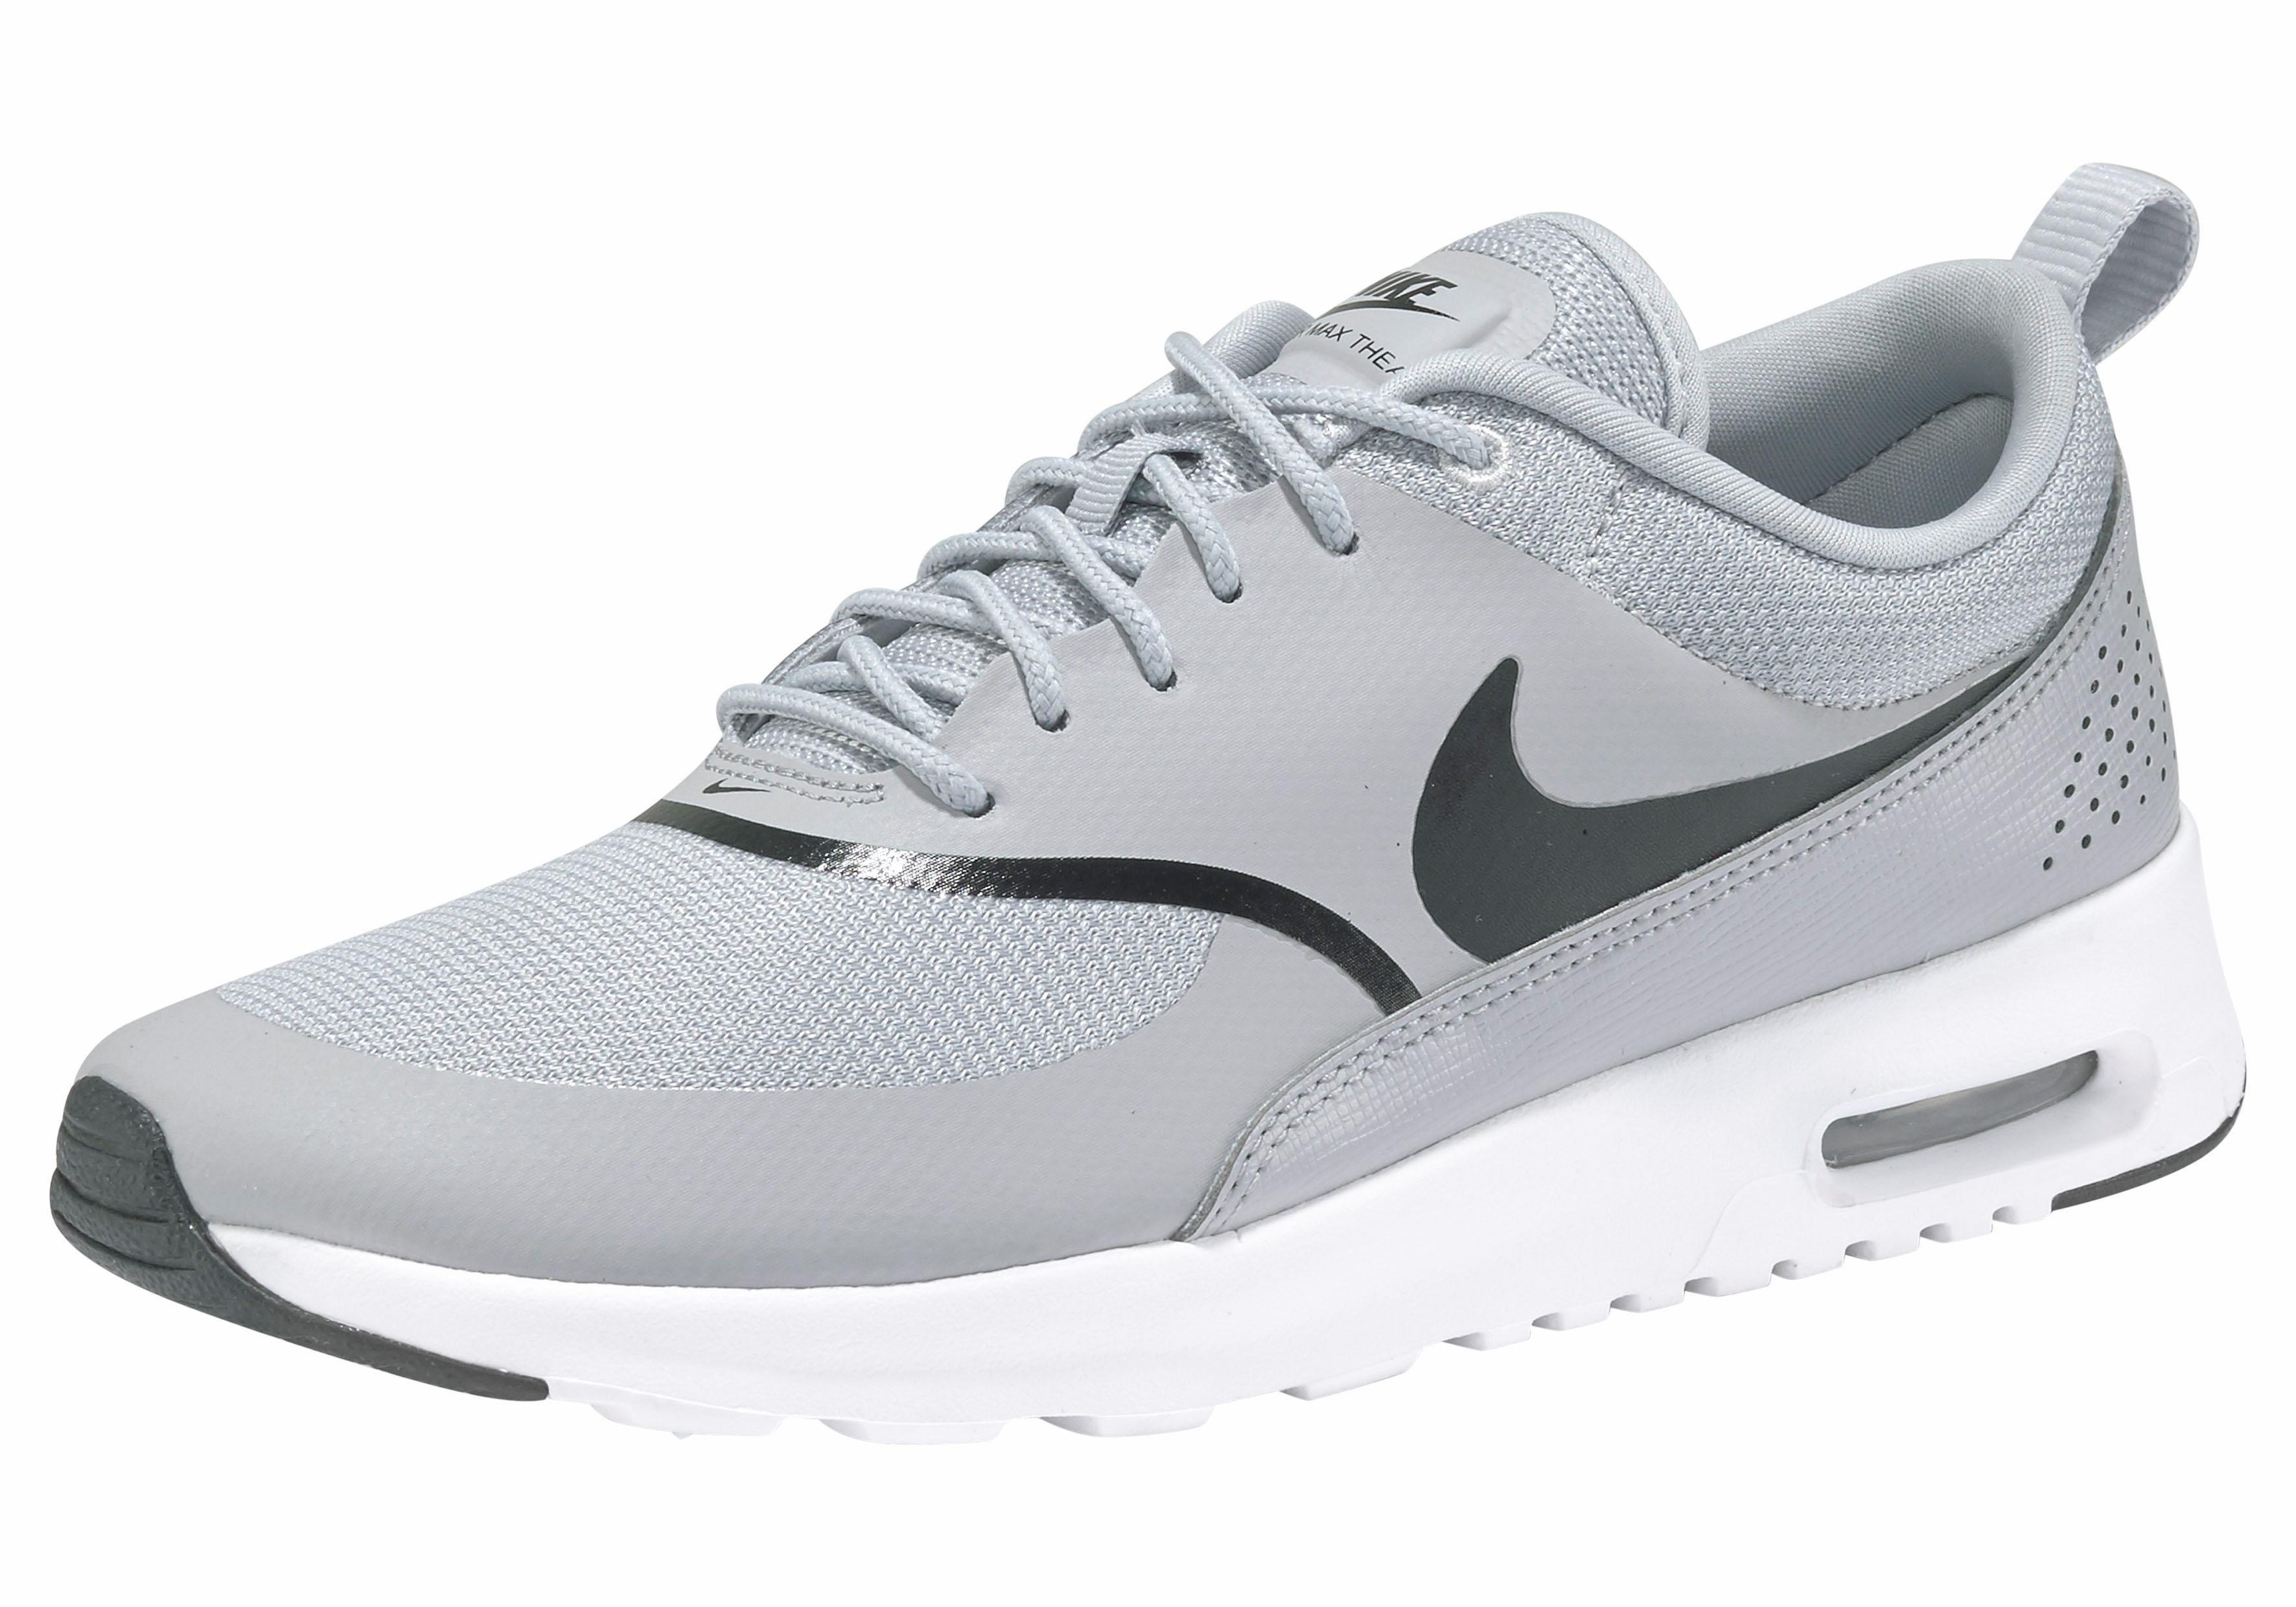 c50c077cf3b ... Nike Sportswear sneakers »Air Max Thea«, Nike Sportswear sneakers »Air  Max Thea«, Nike Sportswear sneakers »Air Max Thea«, Nike Sportswear ...